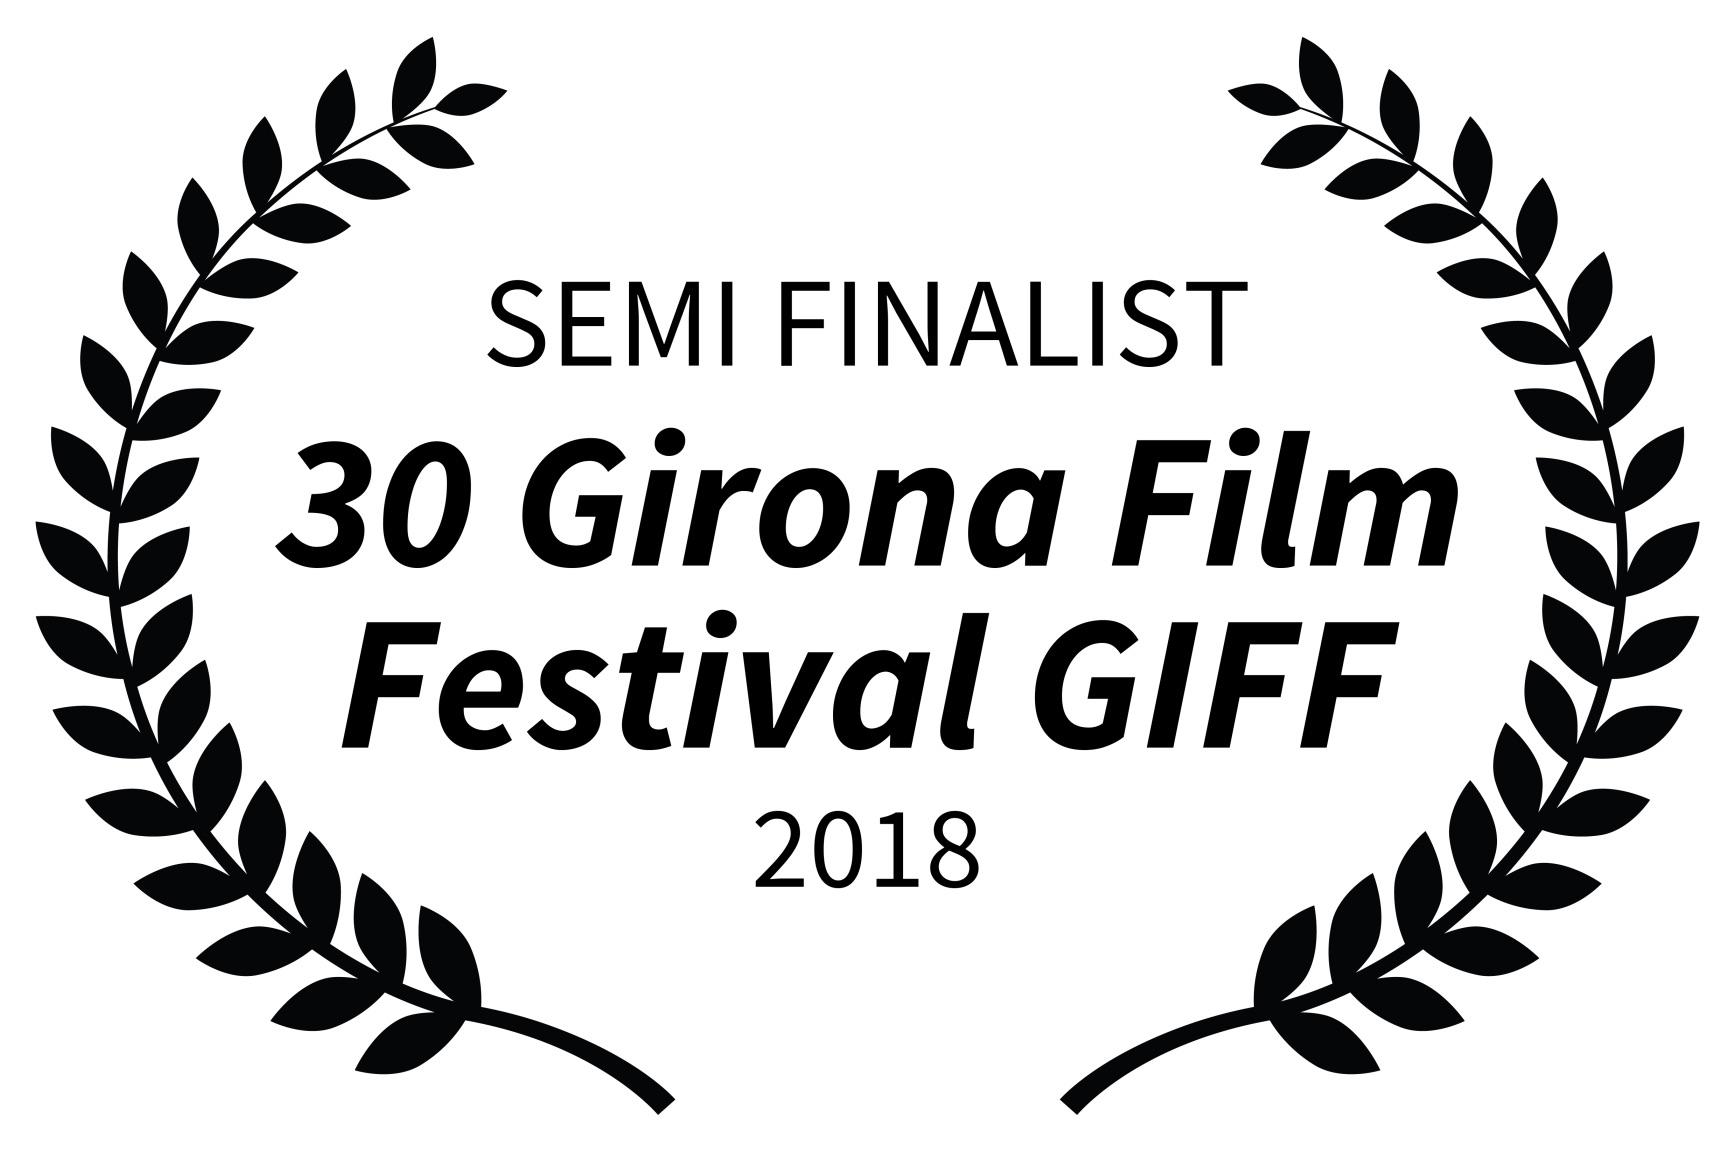 SEMI FINALIST - 30 Girona Film Festival GIFF - 2018